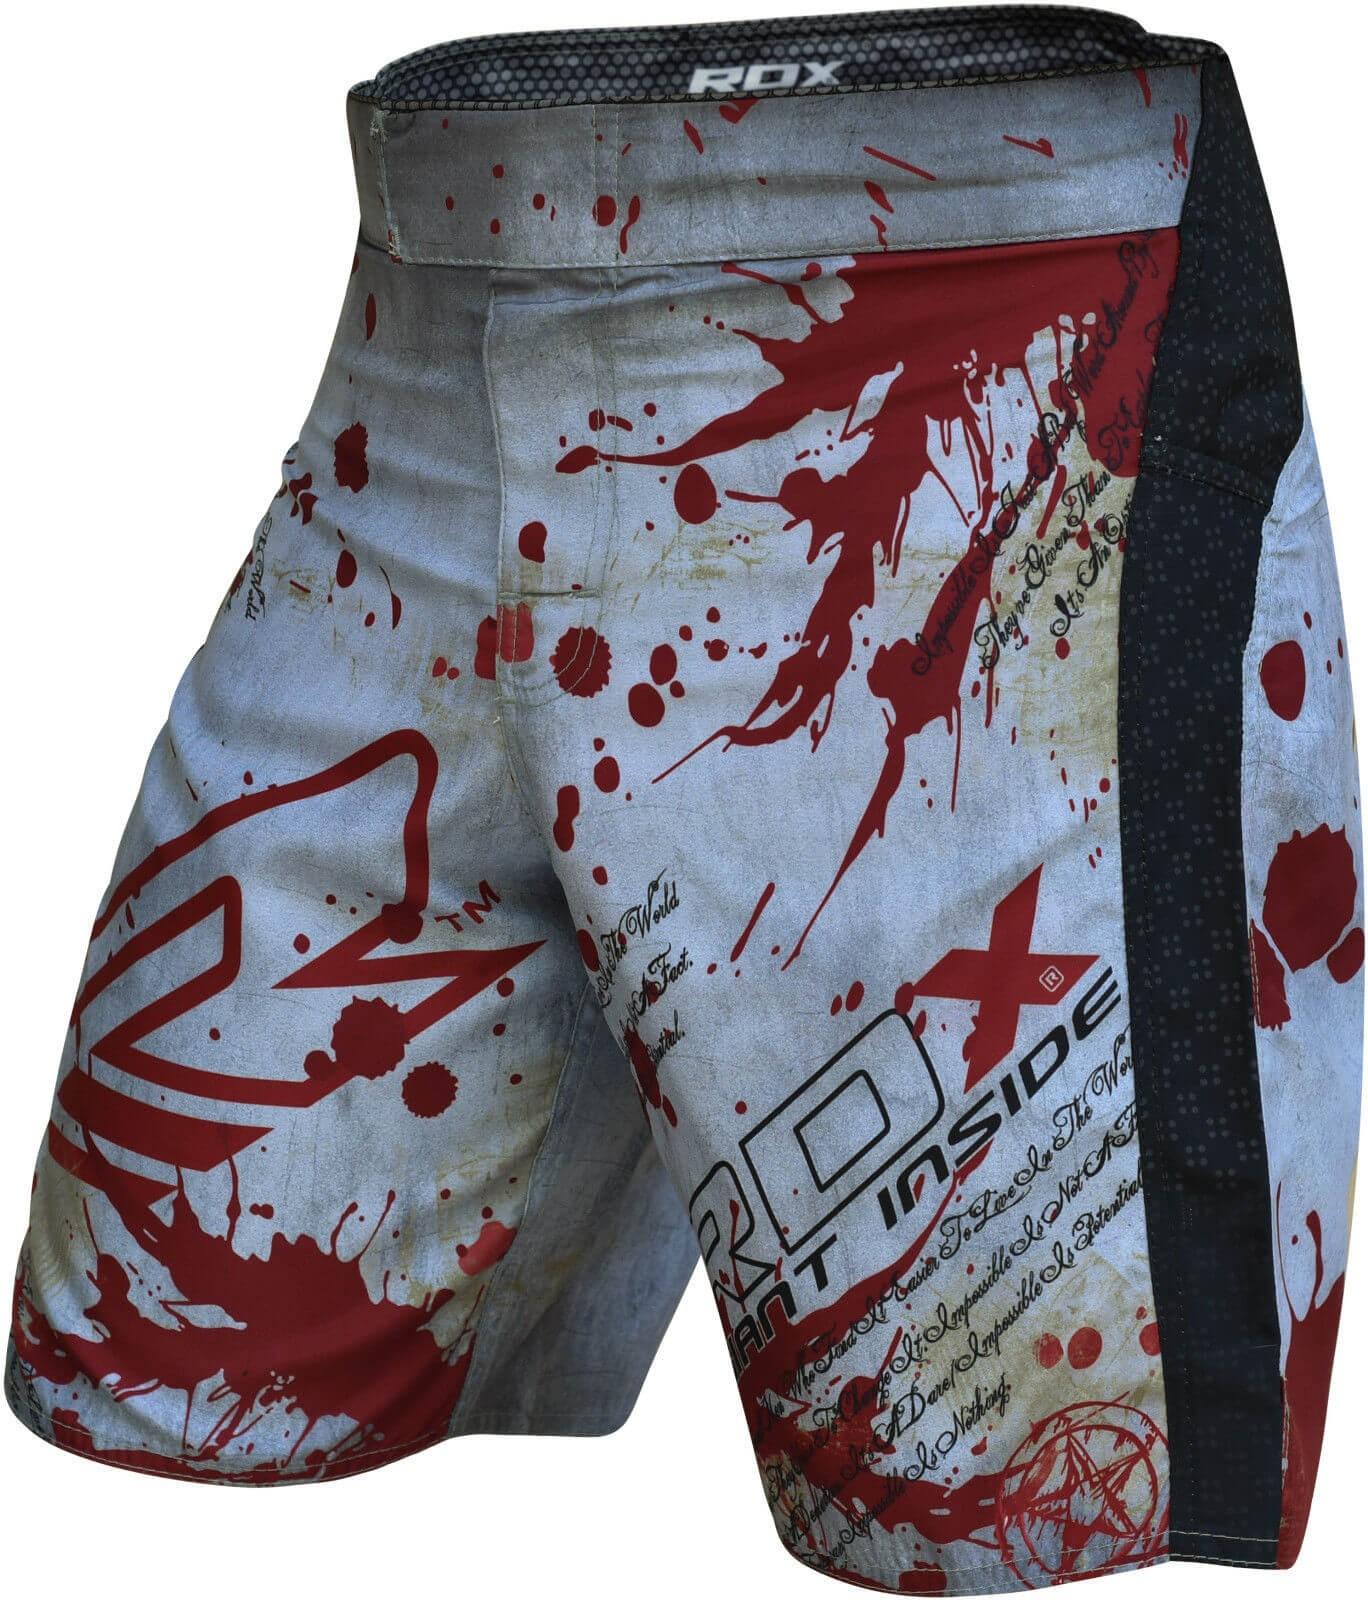 Купить Шорты RDX MMA Grappling Shorts Revenge Series Blood, 6152_wh_rd